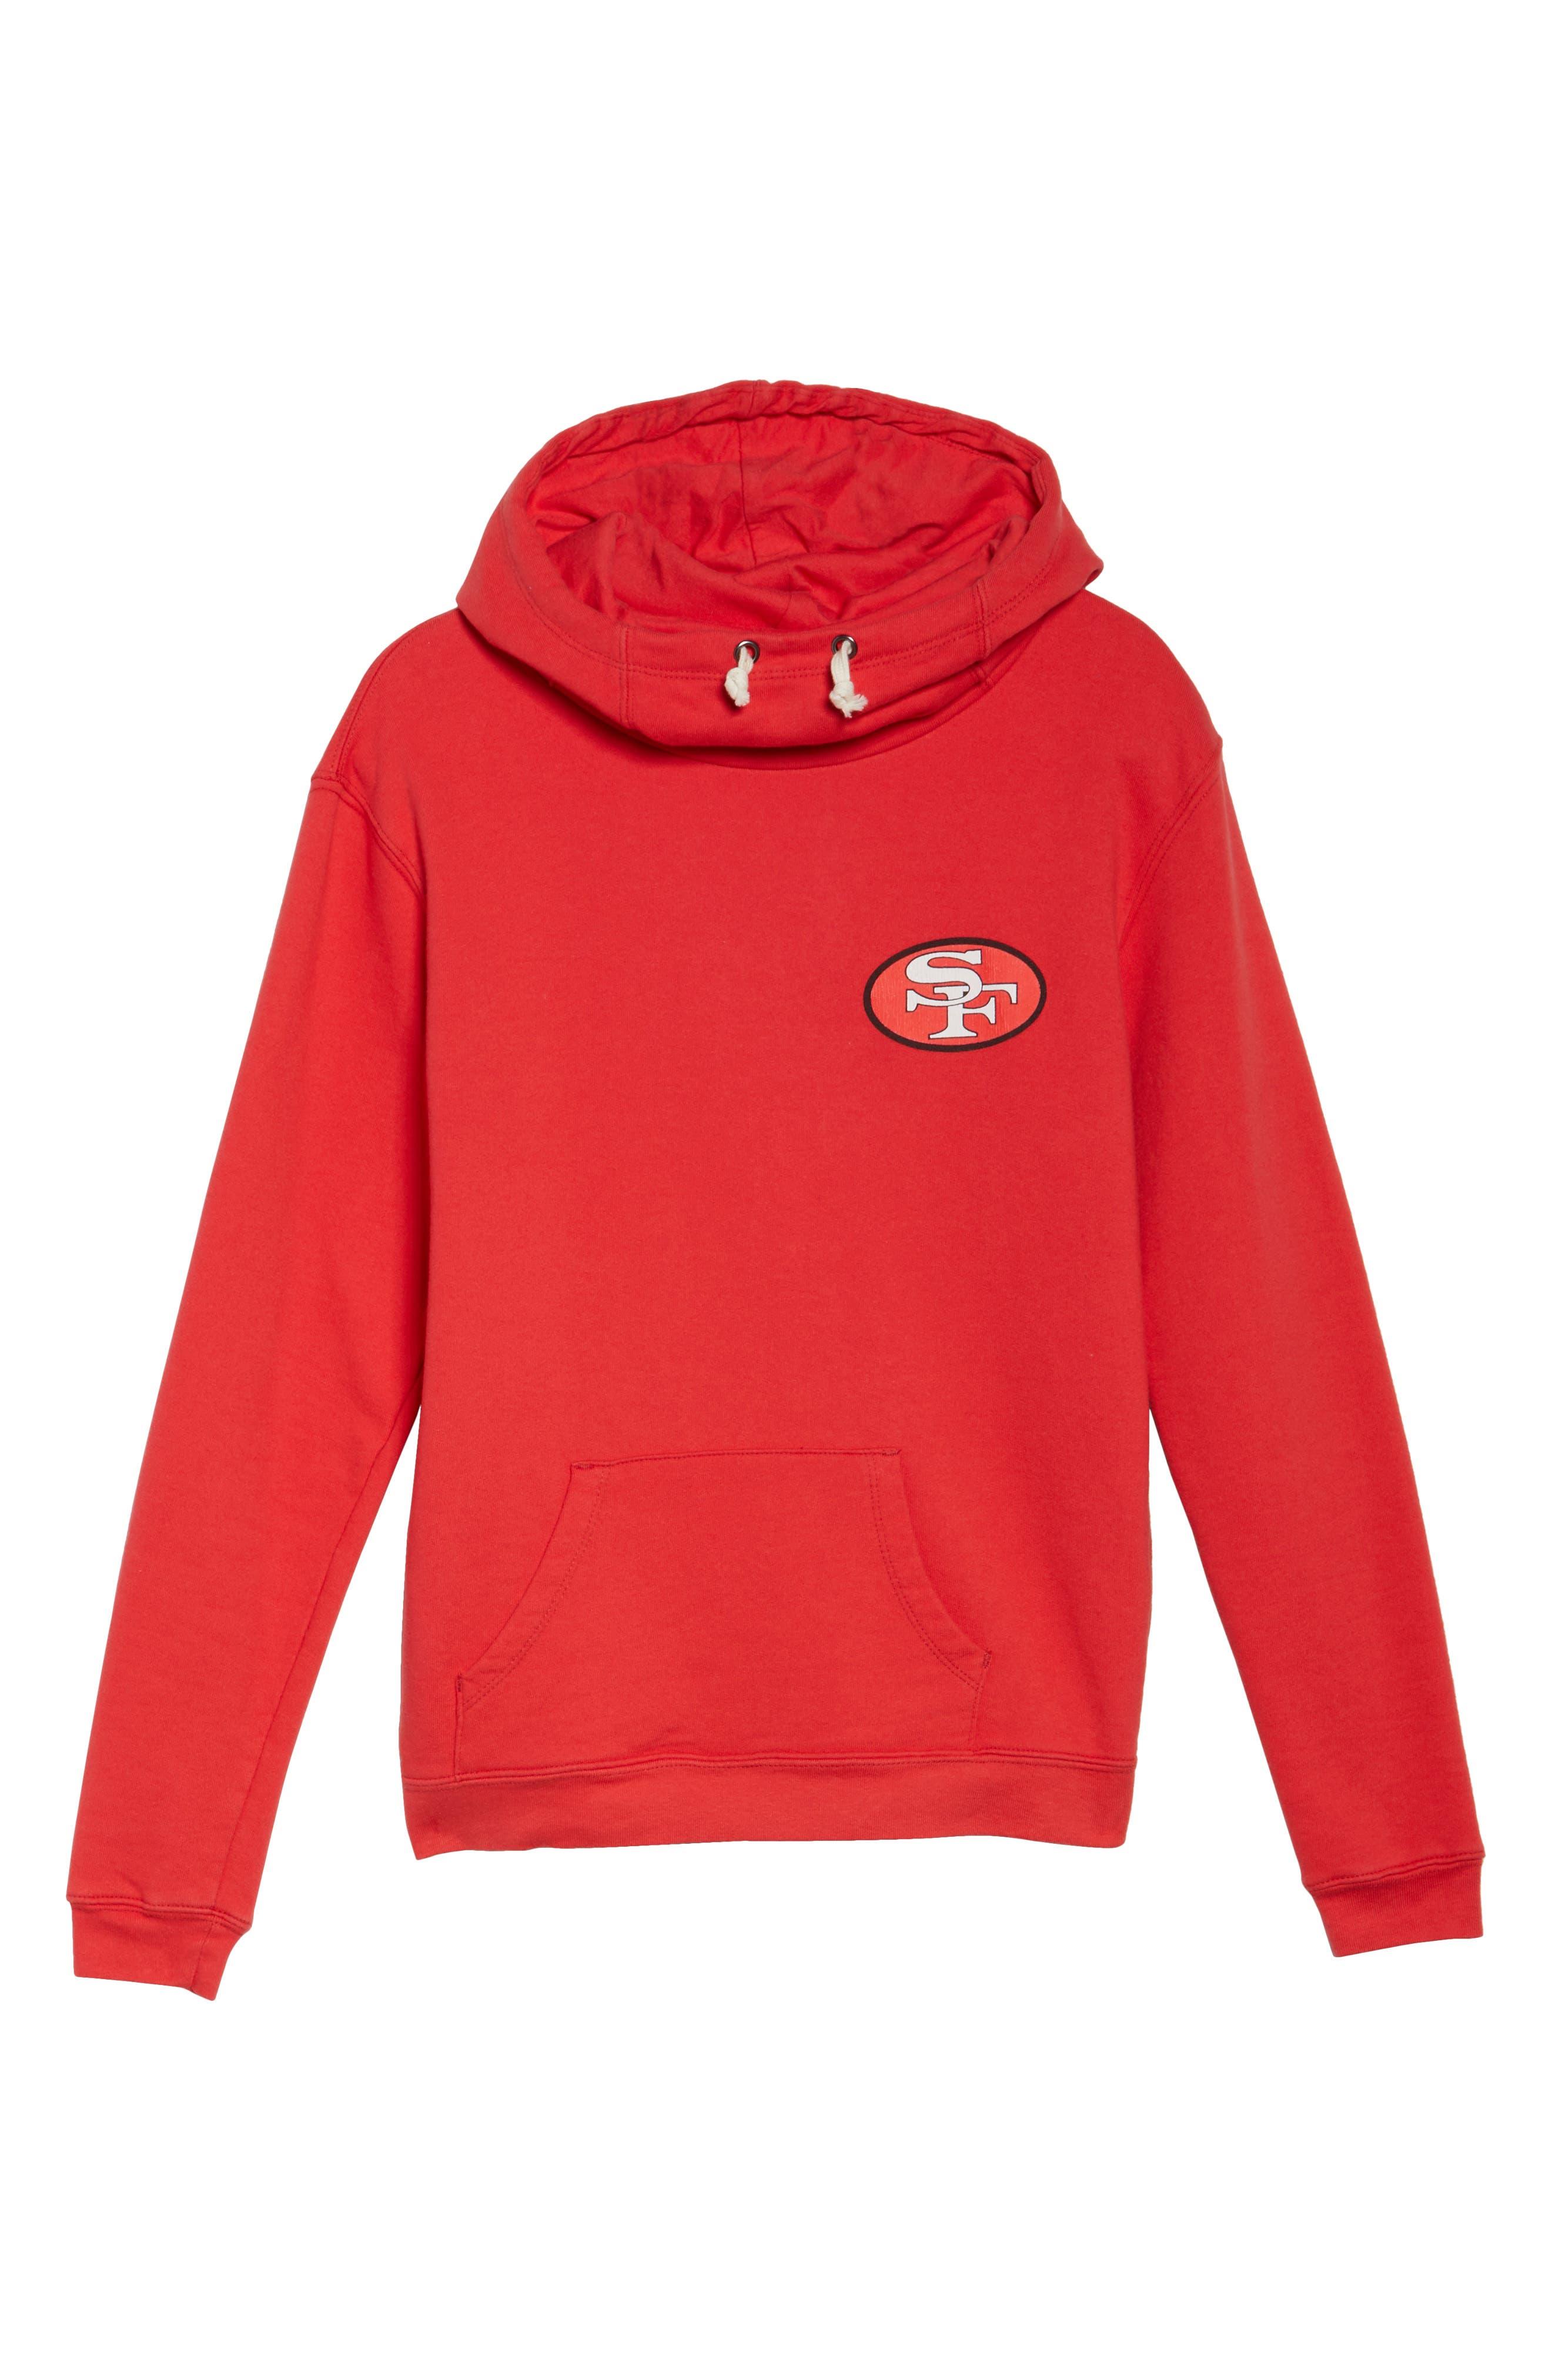 NFL San Francisco 49ers Sunday Hoodie,                             Alternate thumbnail 6, color,                             622